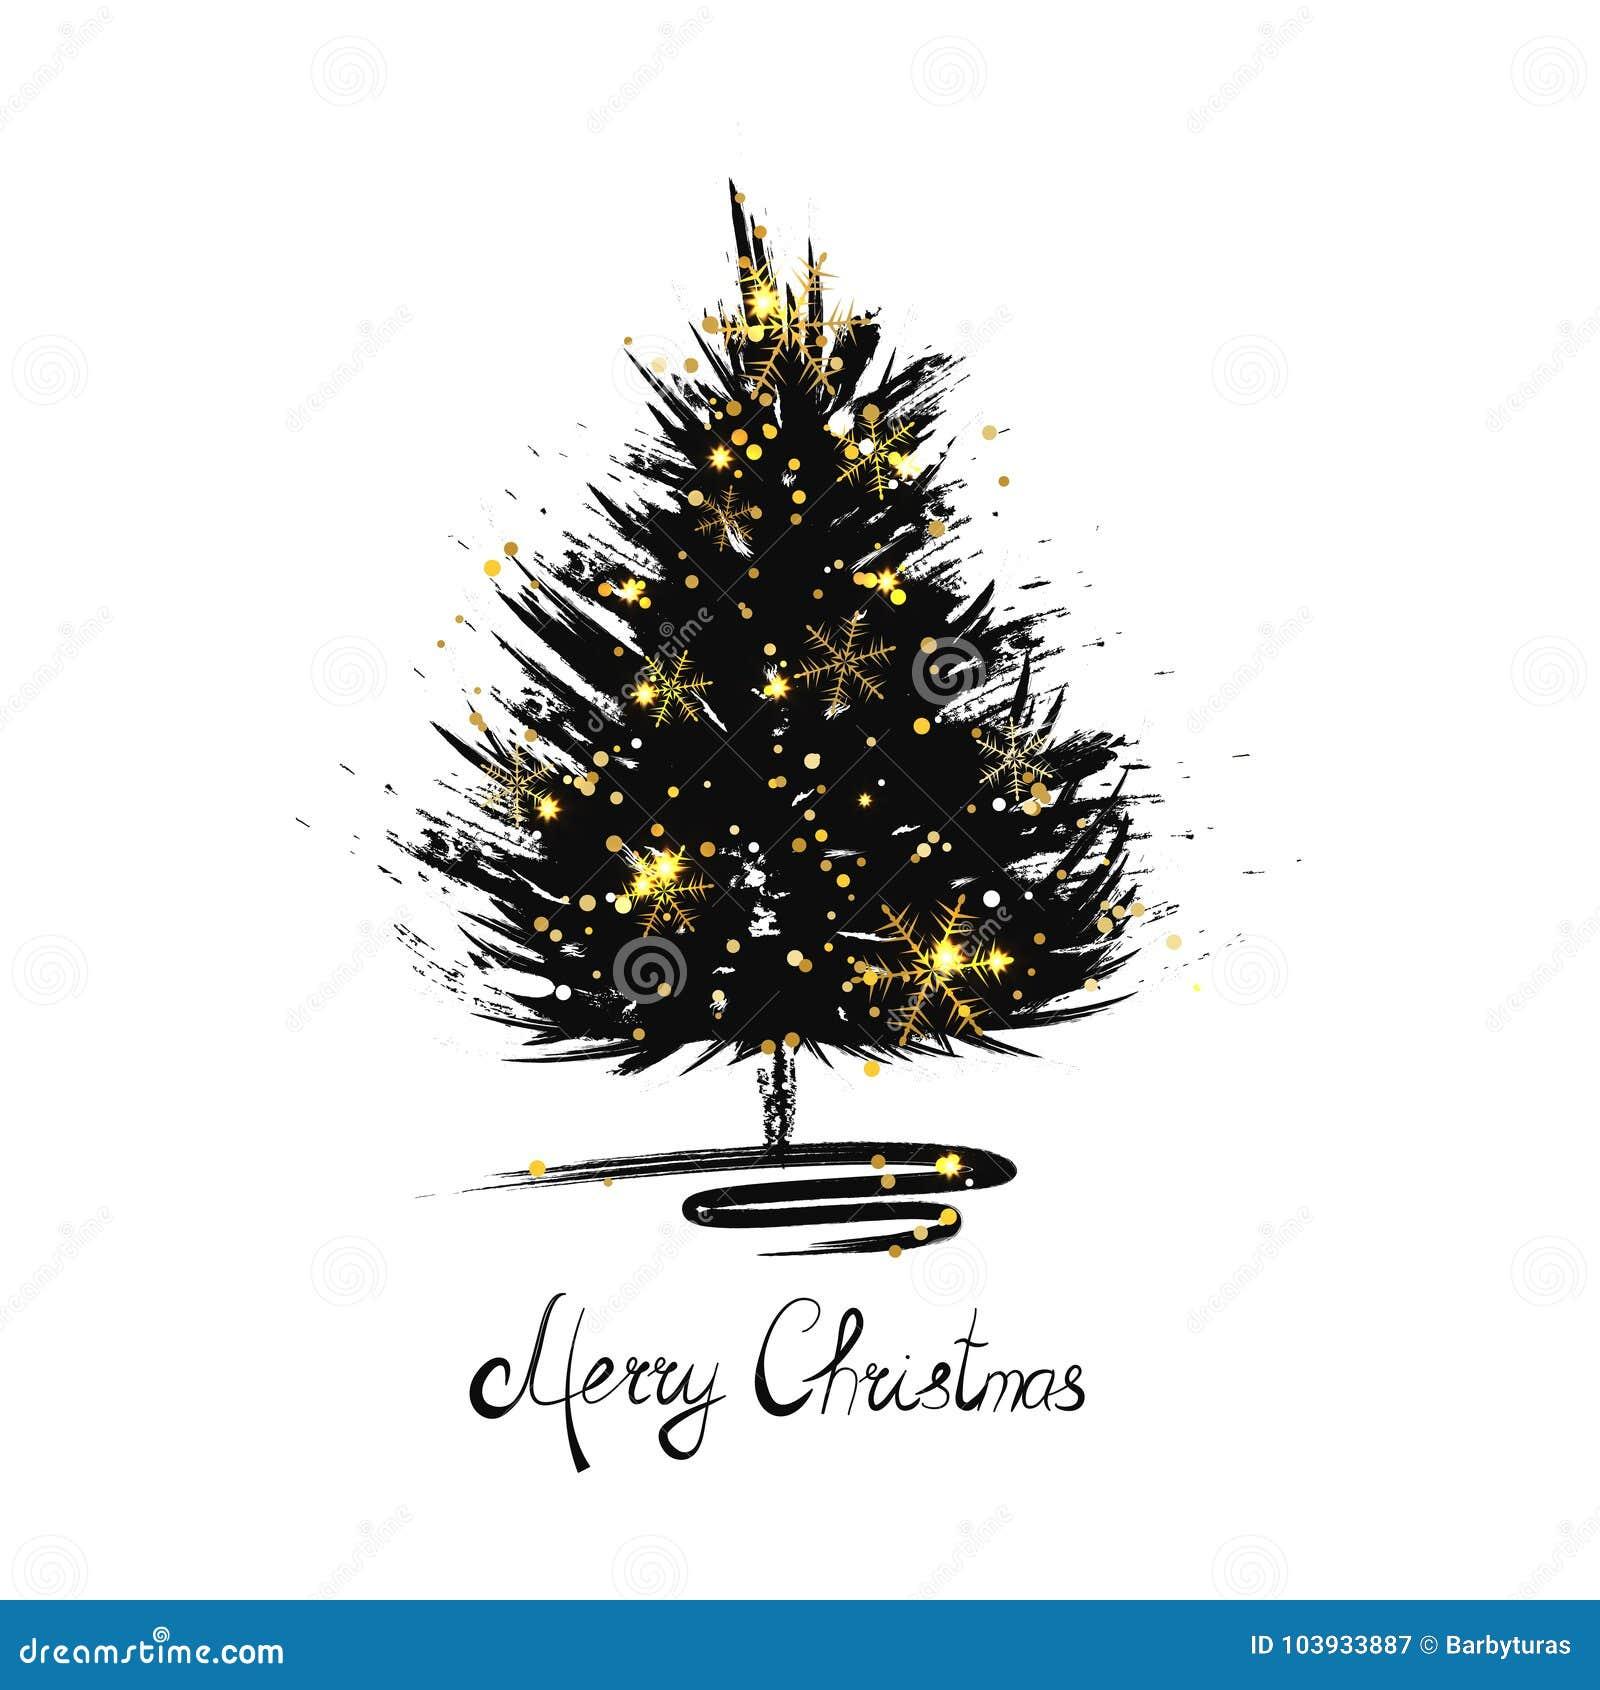 Christmas Greeting Card With Xmas Tree Sketch Stock Illustration